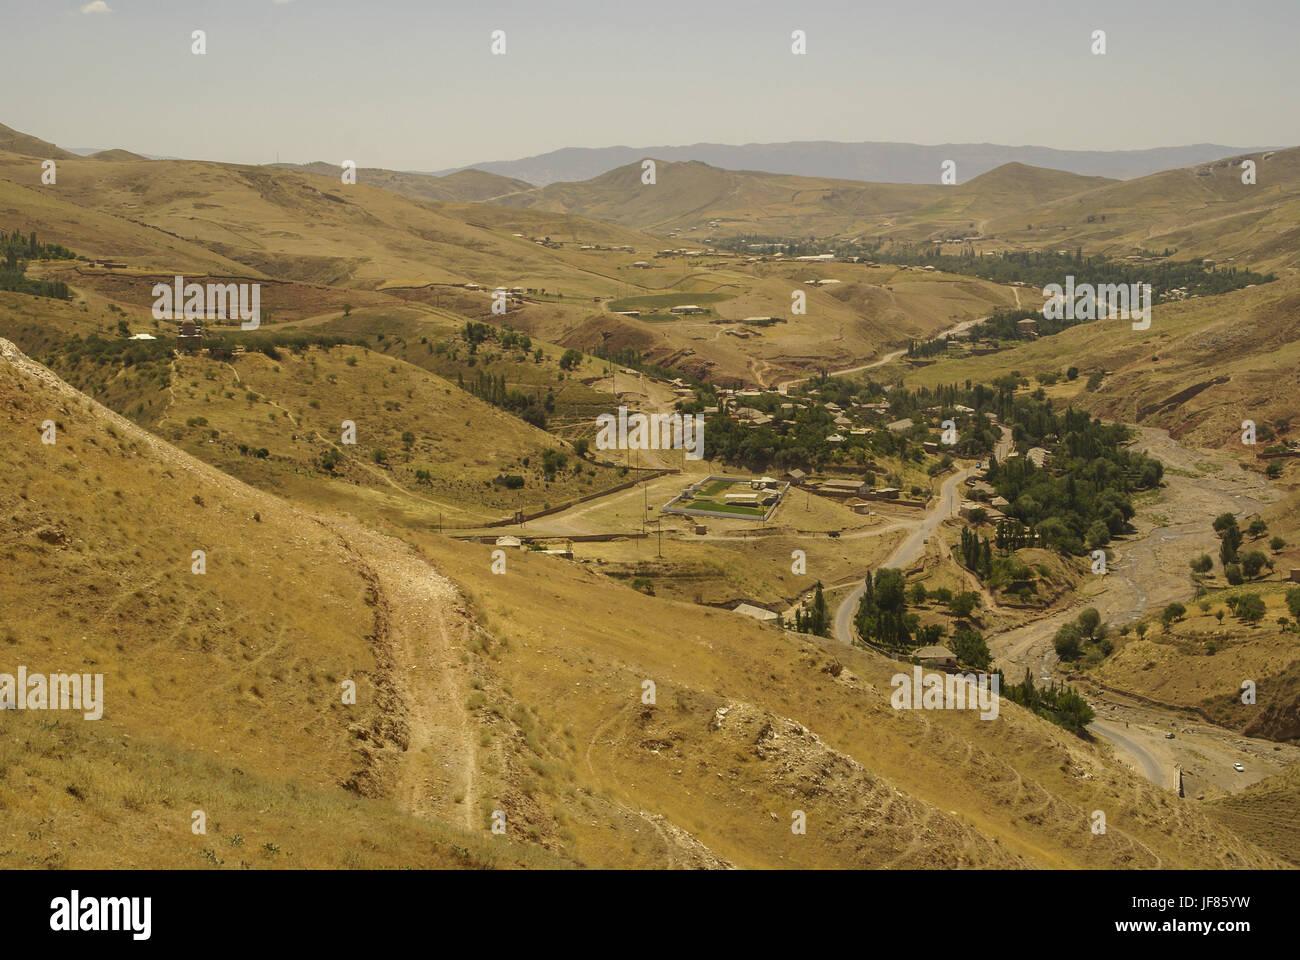 Semi-desert in Uzbekistan - Stock Image